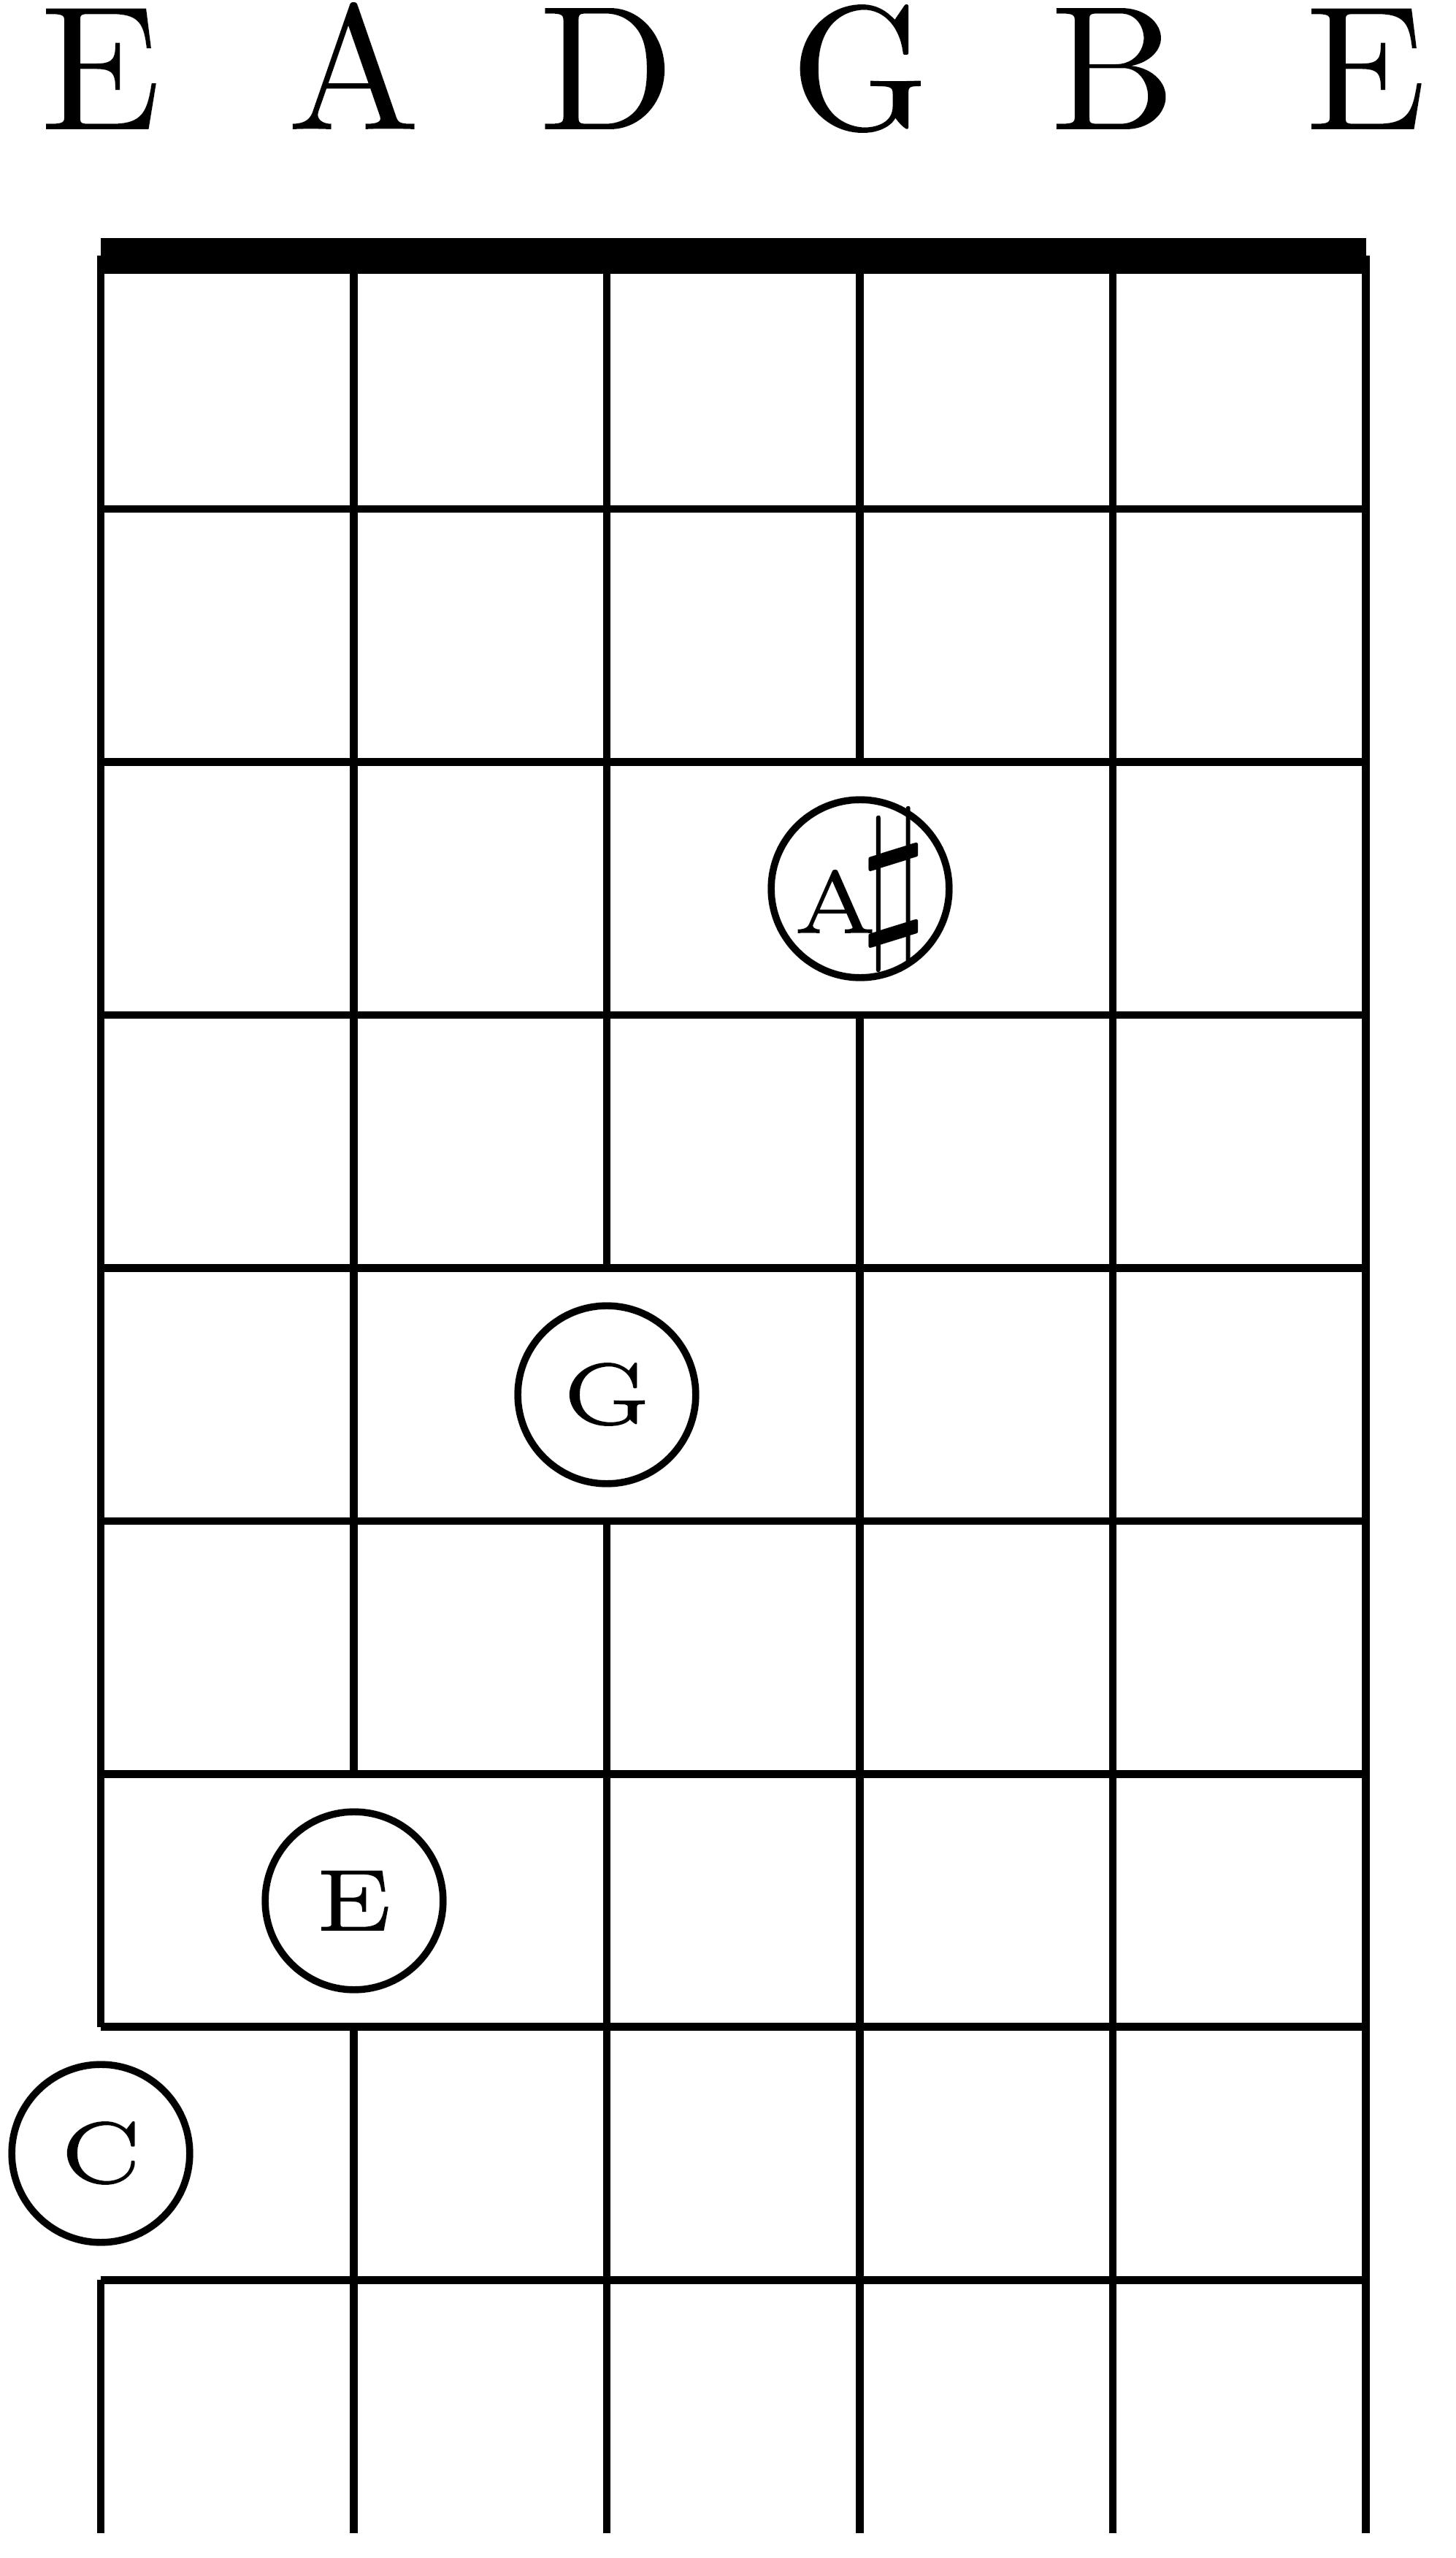 guitar hand diagram  guitar  free engine image for user